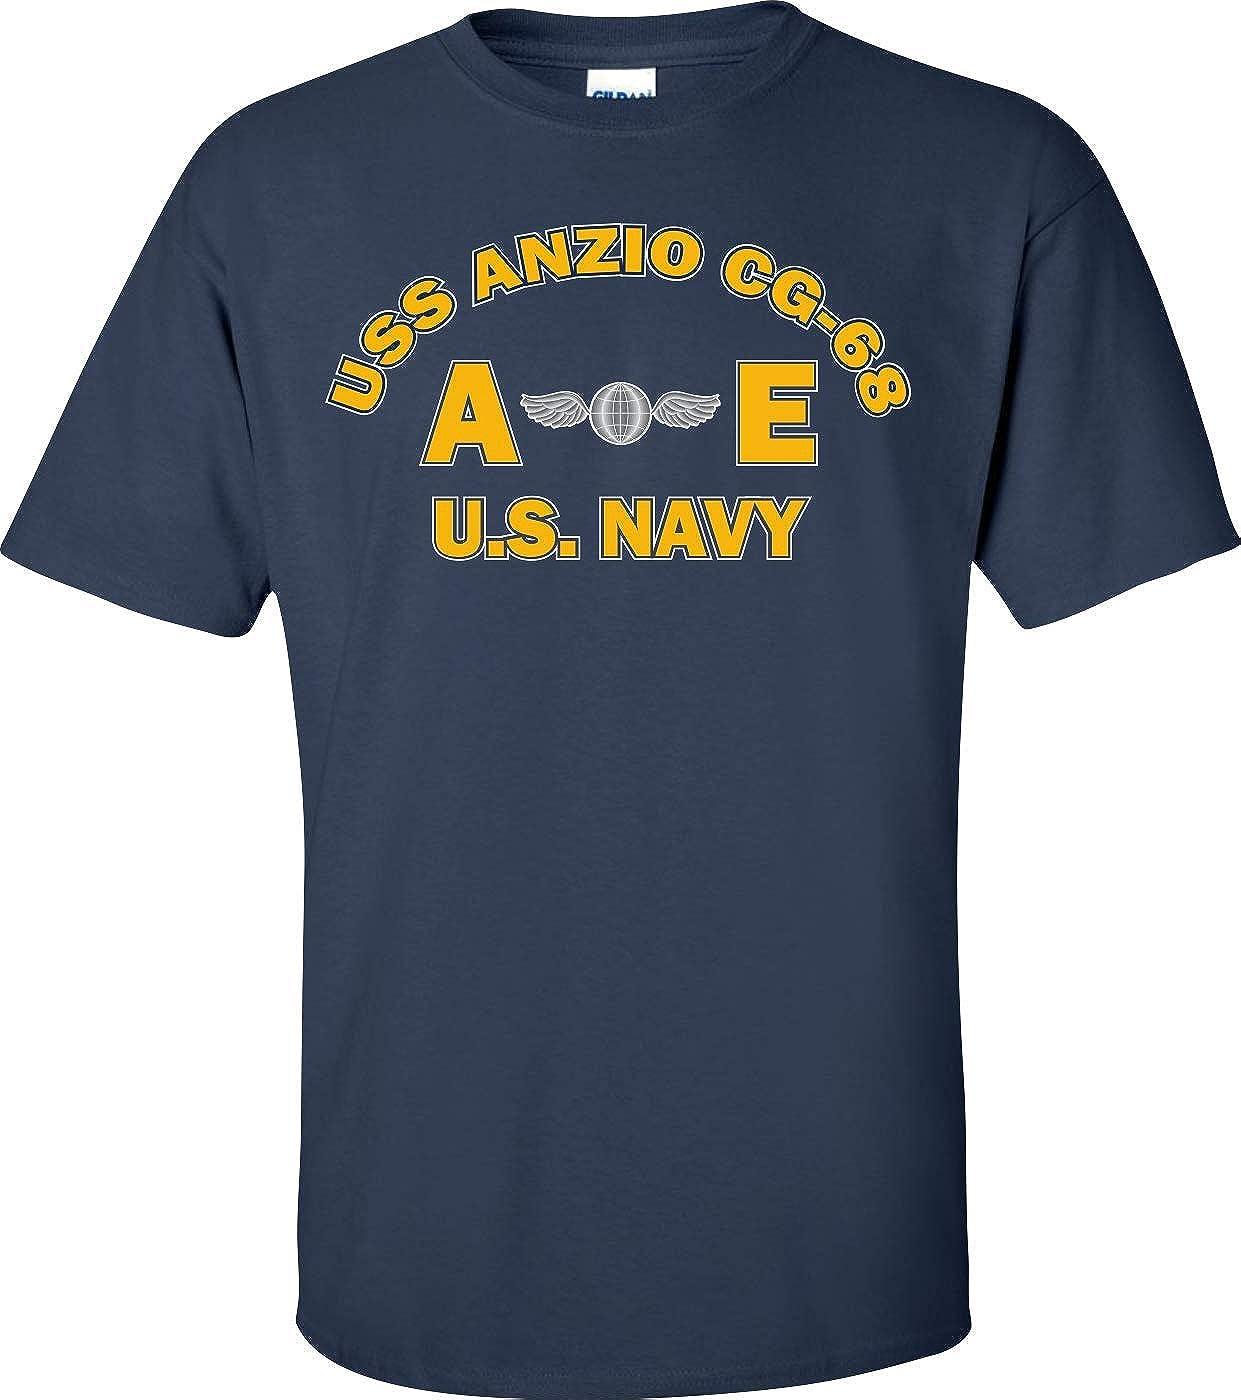 US Navy USS Anzio CG-68 T-Shirt